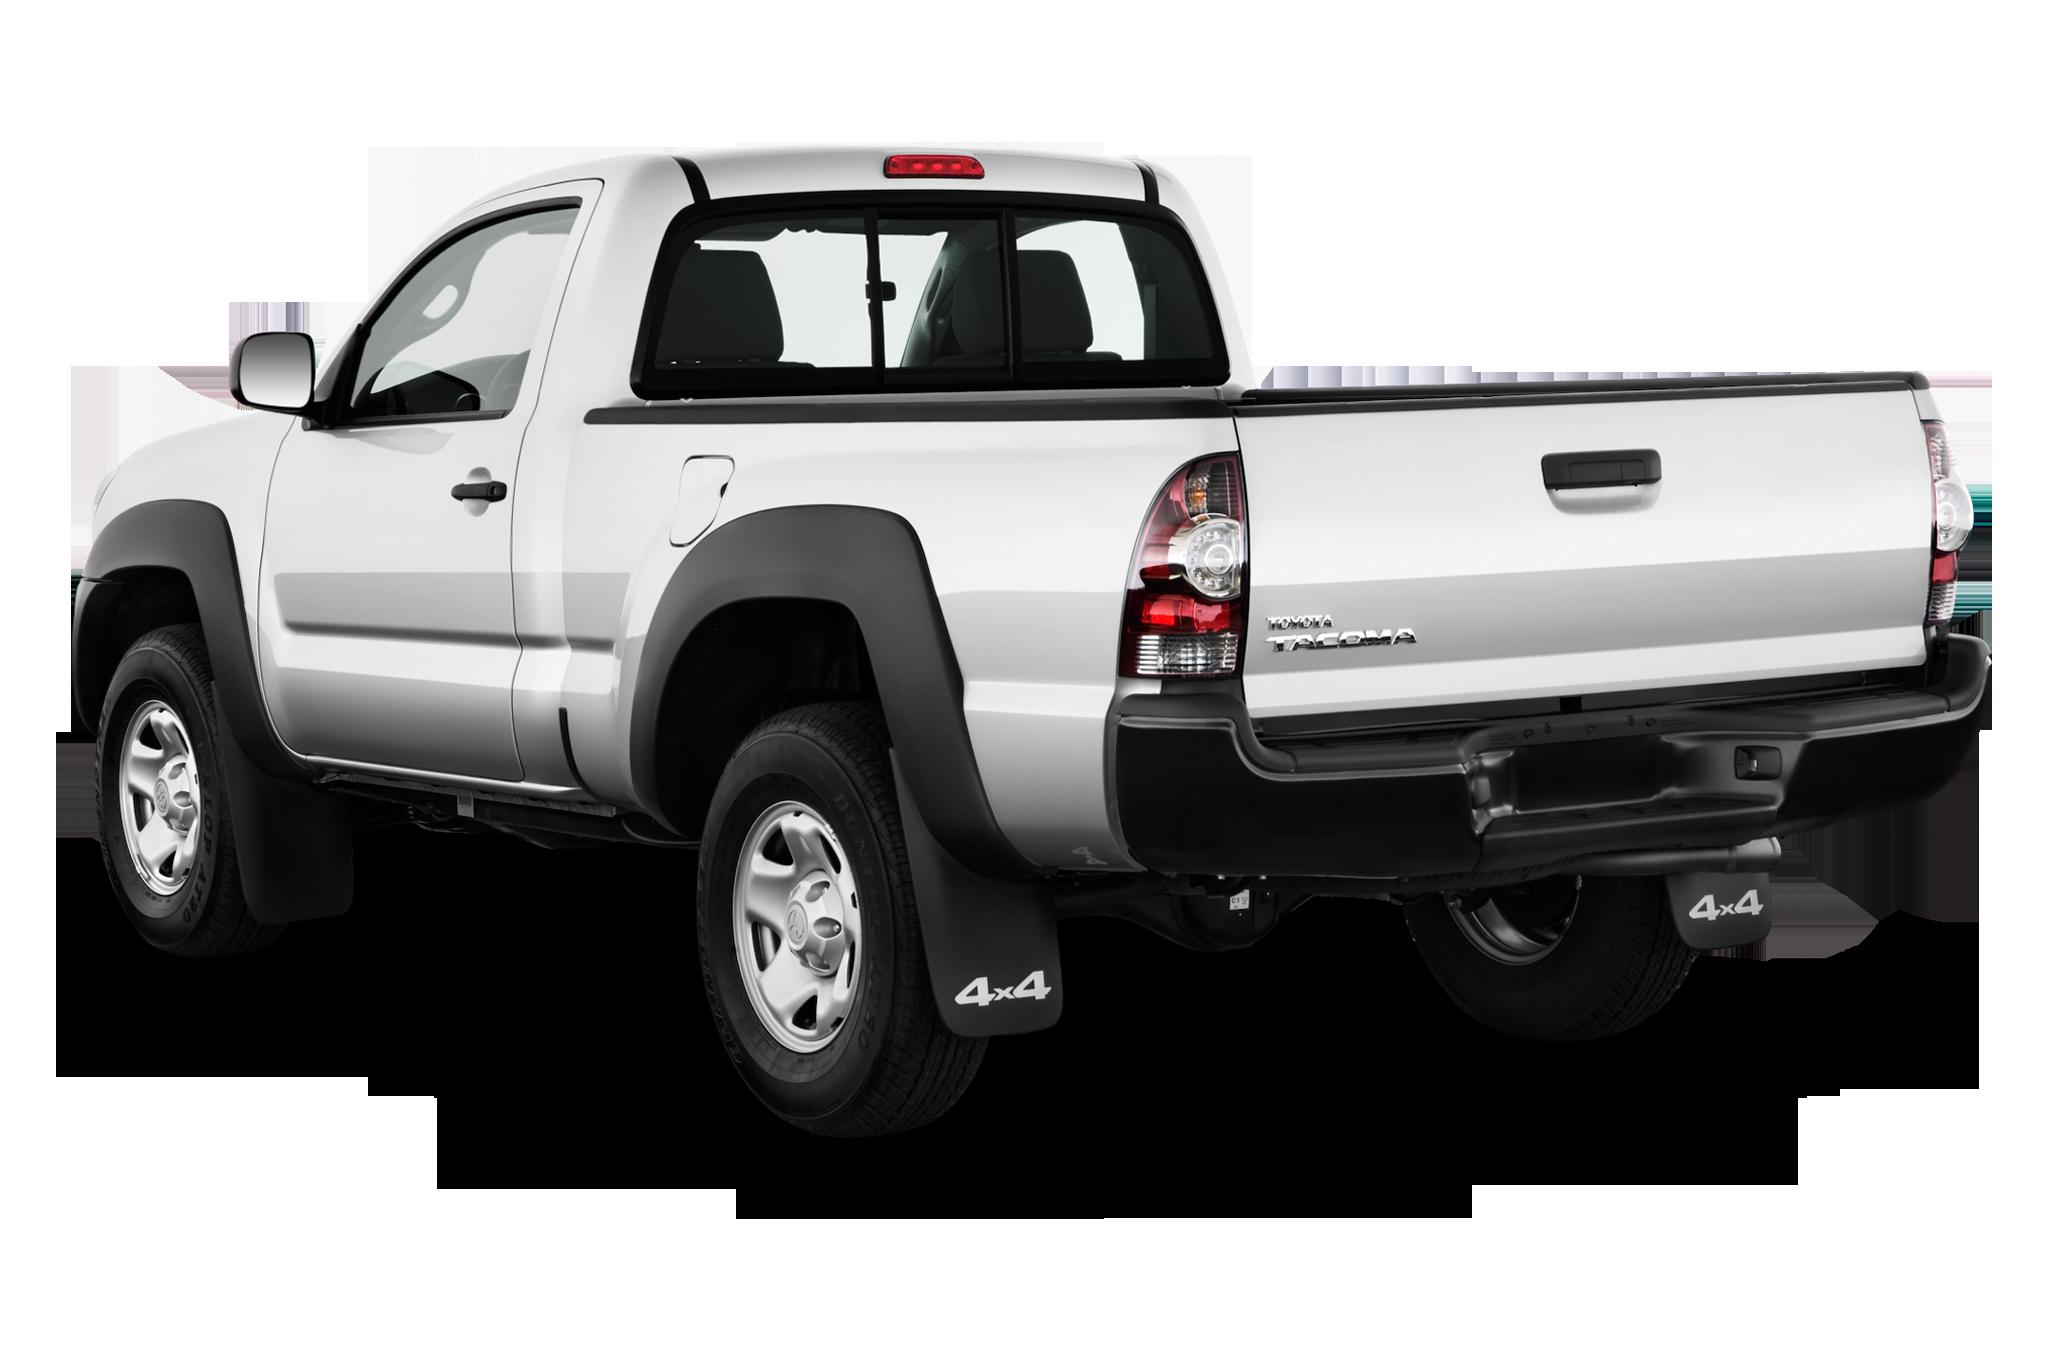 2011 Toyota Tacoma Double Cab Editors Notebook Automobile Magazine